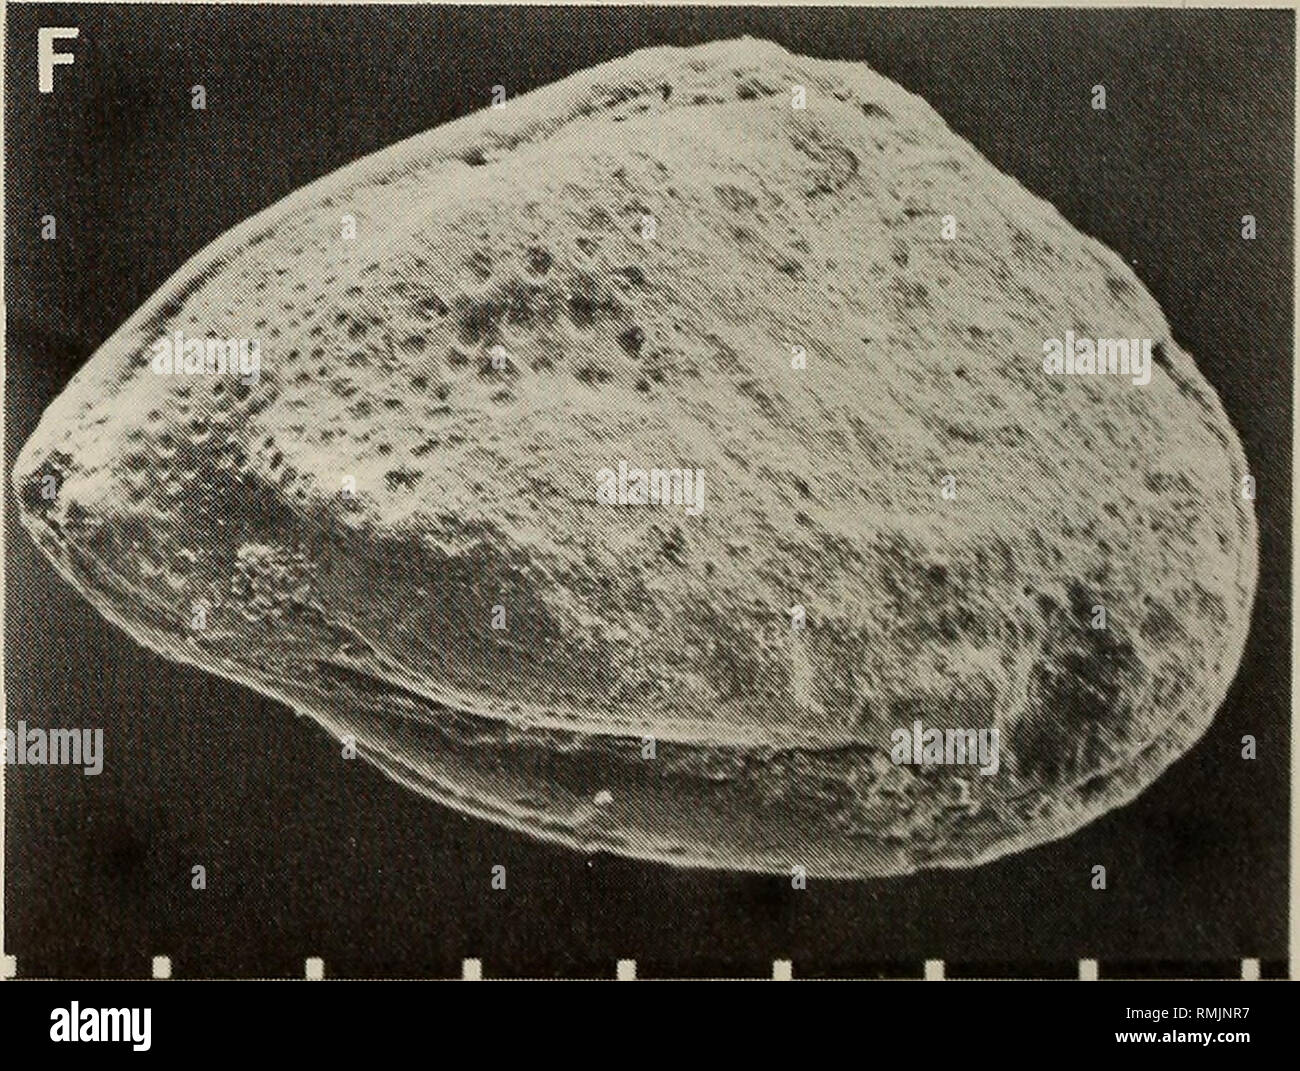 . Annali della South African Museum = Annale van die Suid-Afrikaanse museo. Storia naturale. Fig. 18. Brachycythere. A. B. agulhasensis, SAM-PC6522, holotype, MS, LV, TBD 510, Agulhas Bank, Alphard Formazione, Coniacian inferiore, SEM 1809. B. sicarius, SAM-PC6523, RV, Umzamba letto 3, Santonian III, SEM 2058. C. B. pondolandensis, SAM-PC6524, holotype, LV, Umzamba letto 1, Santonian II, SEM 2112. D. B. pondo- landensis, SAM-PC6525, RV, Umzamba letto 1, Santonian II, SEM 2115. E. B. rotunda, SAM-PC6526, holotype, LV, Umzamba letto 1, Santonian II, SEM 2092. F. B. rotunda, SAM-PC6527, RV, Umzamba ho letto Immagini Stock